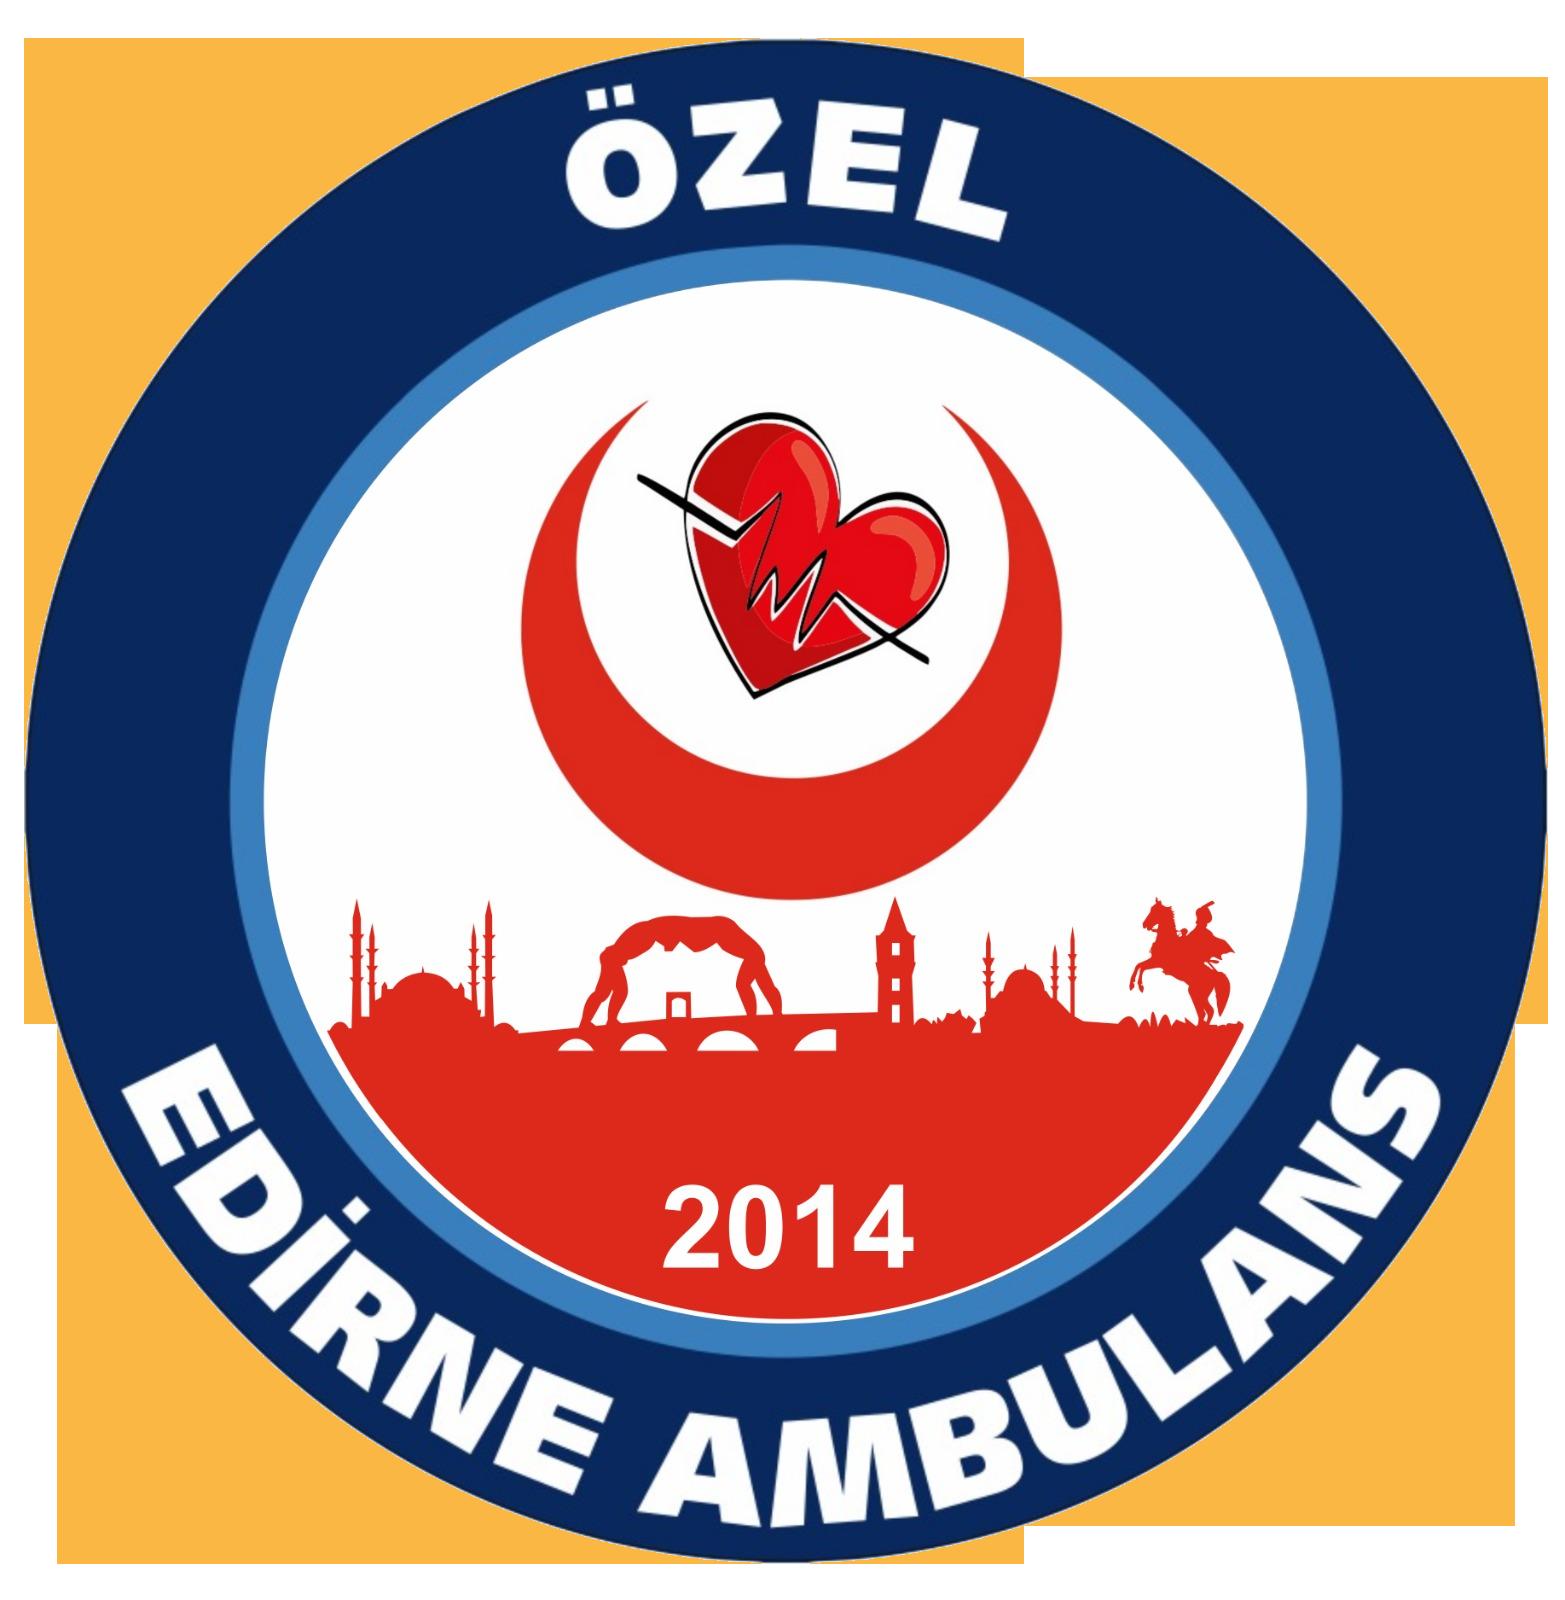 Edirne Ambulans